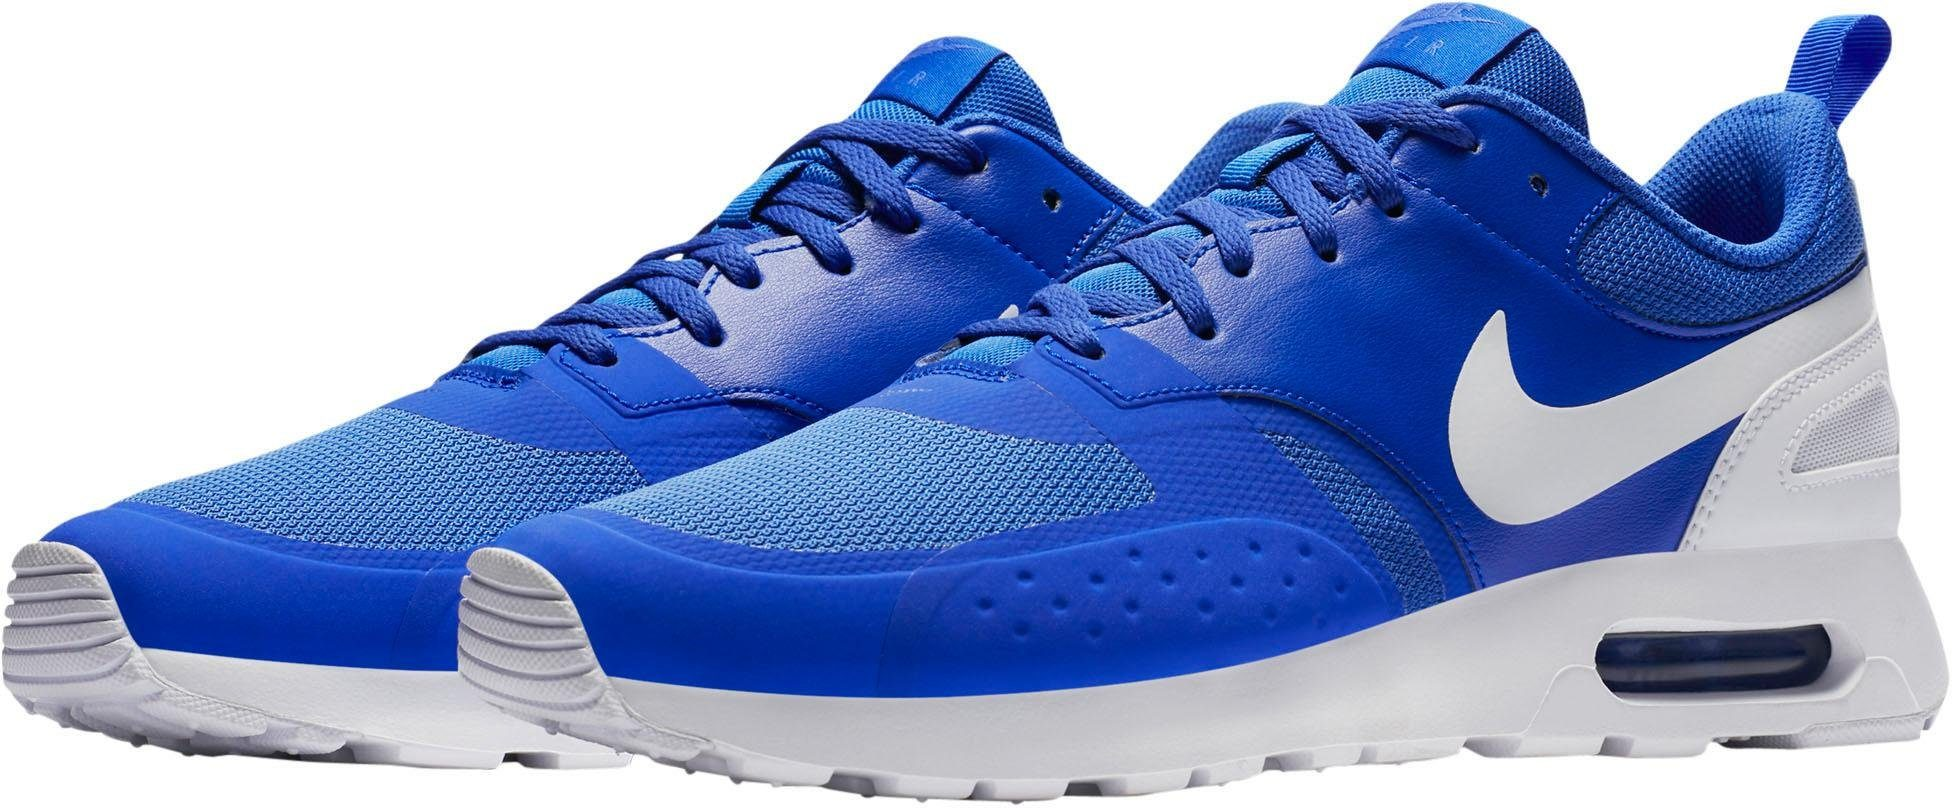 Nike Sportswear »Air Max Vision« Sneaker kaufen | OTTO